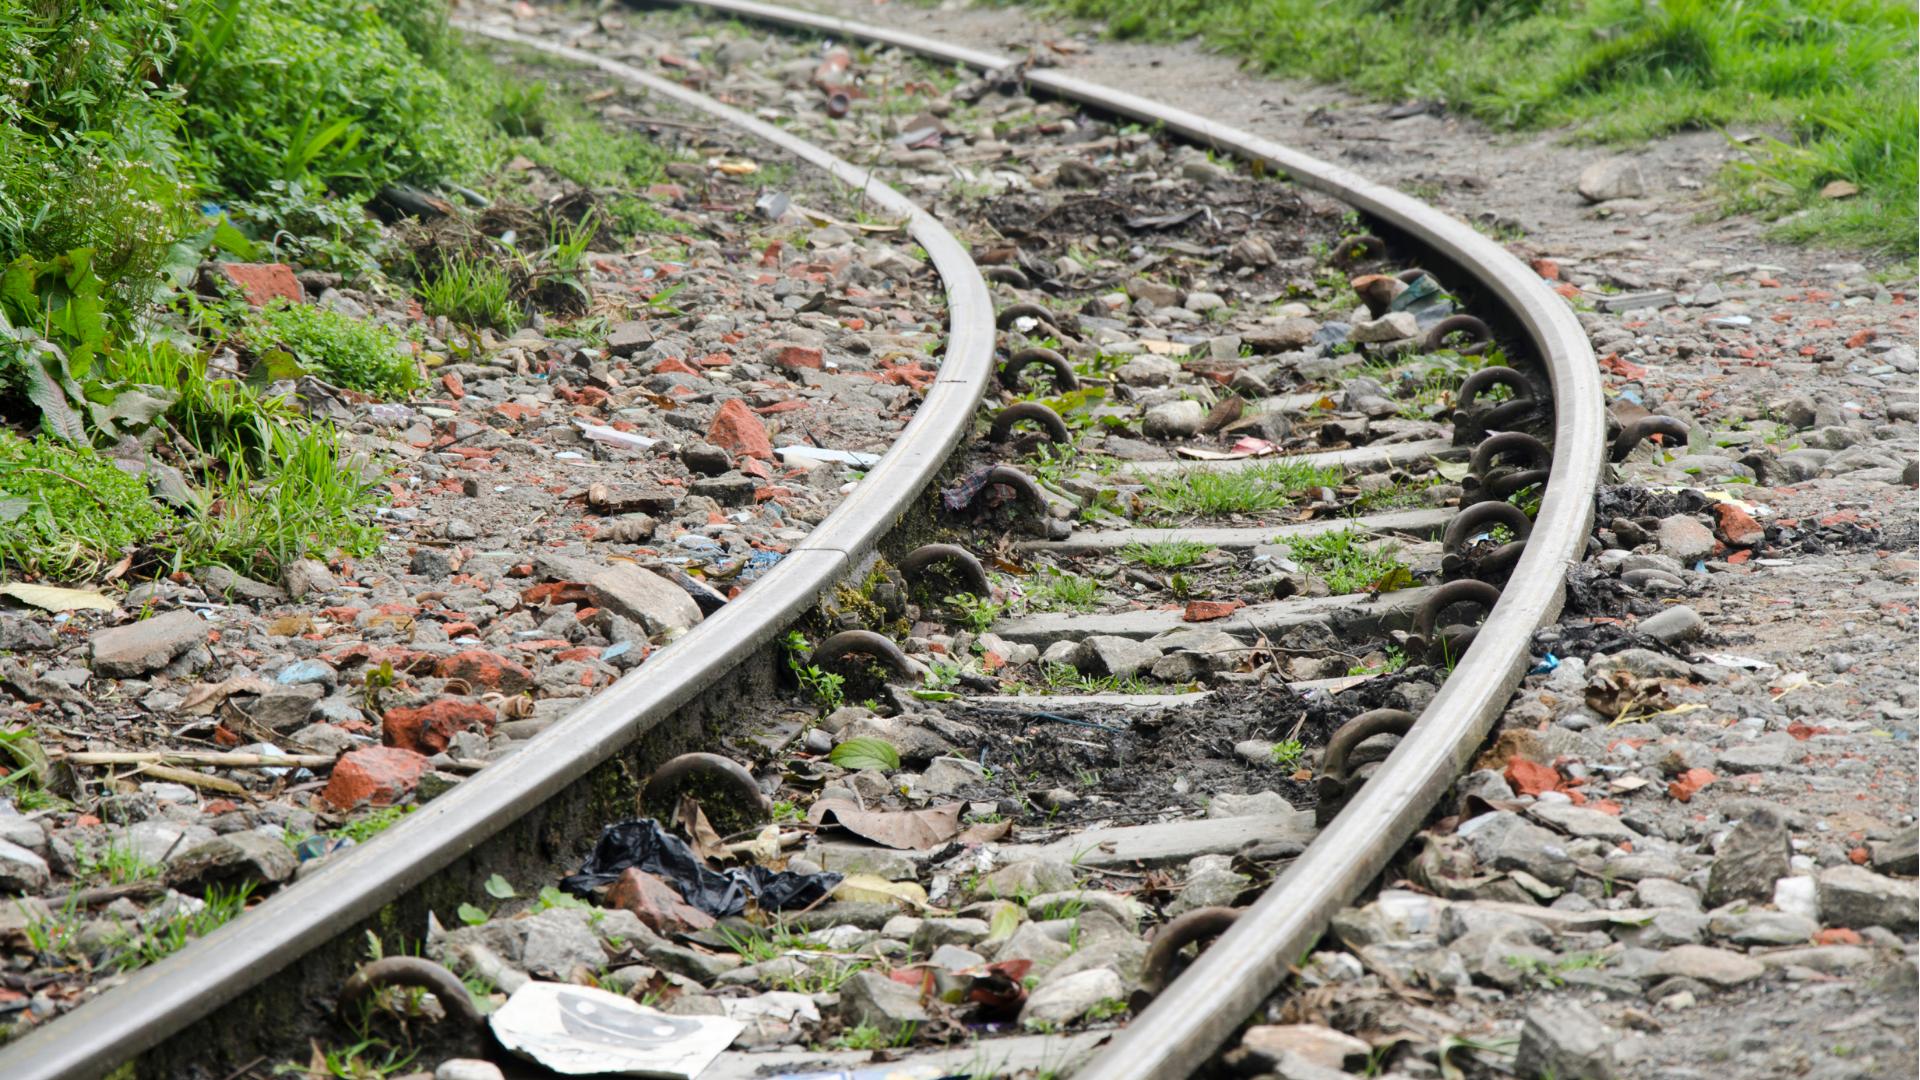 Sustainable glyphosate use on roadsides, railways, public utilities and parks